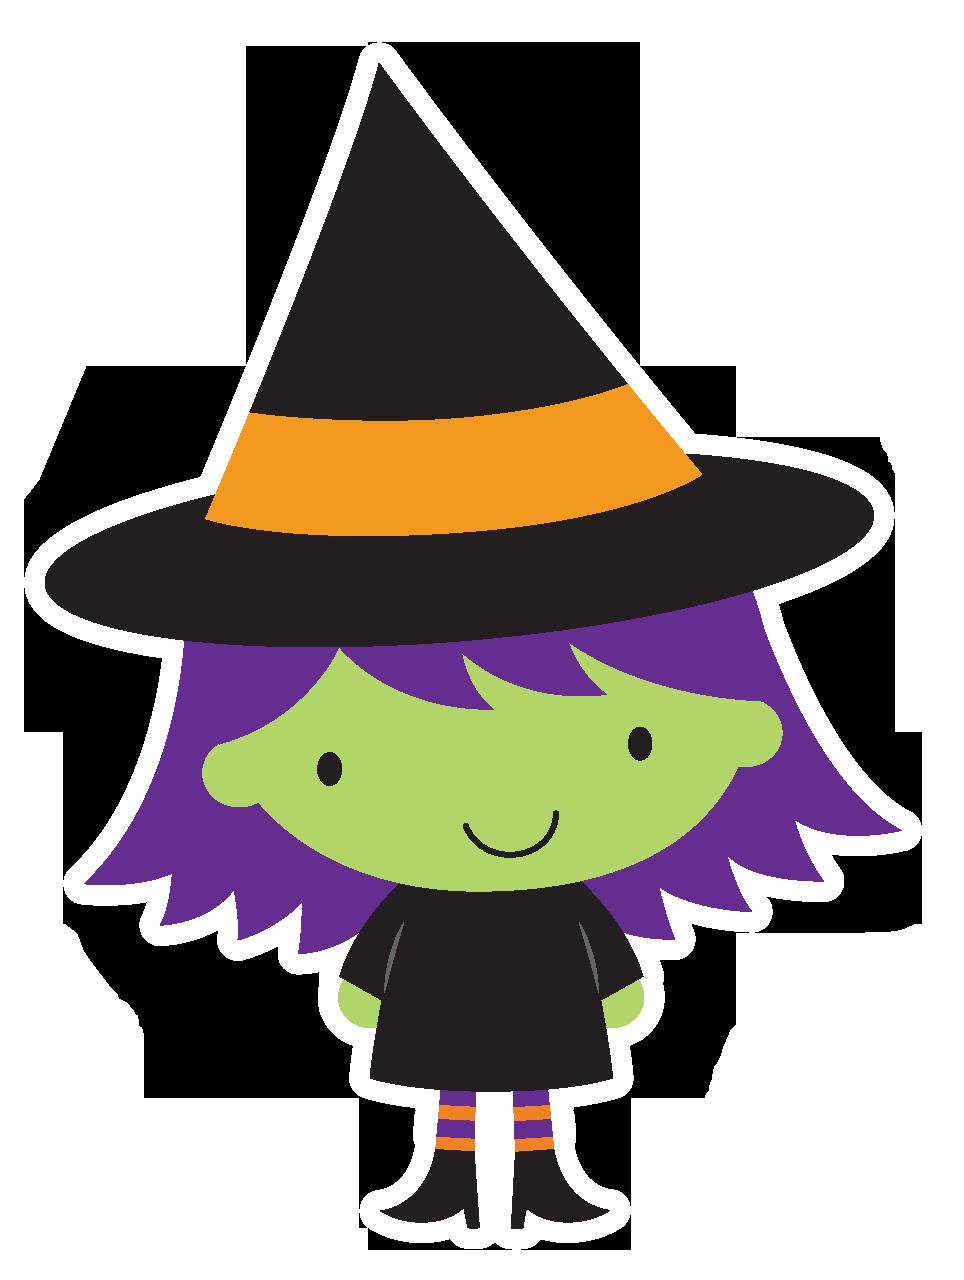 Frankenstein clipart dr frankenstein. Halloween nkubo witch png